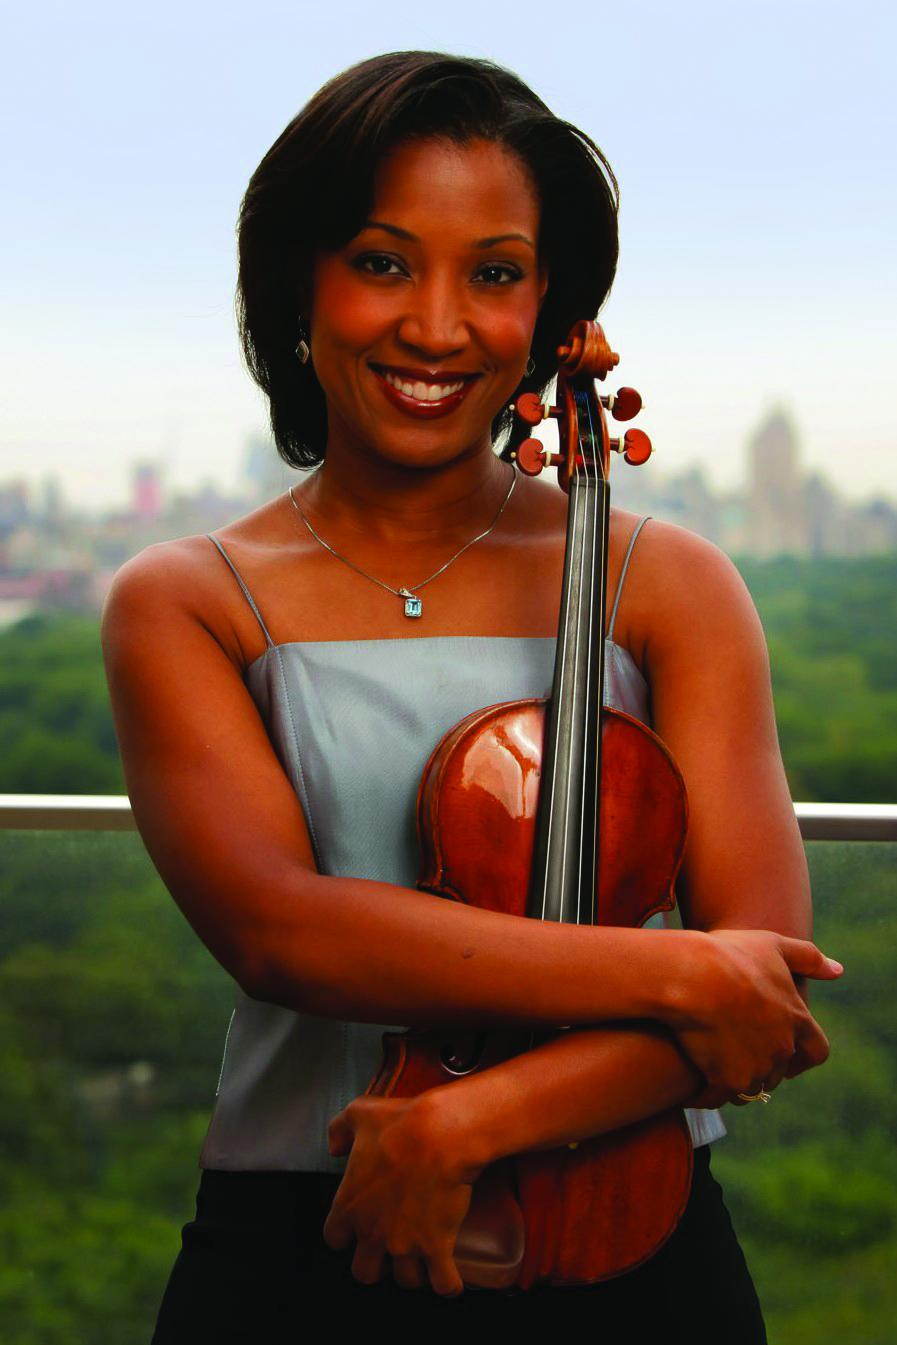 Violin 1, Kelly Hall Tompkins, Concertmaster